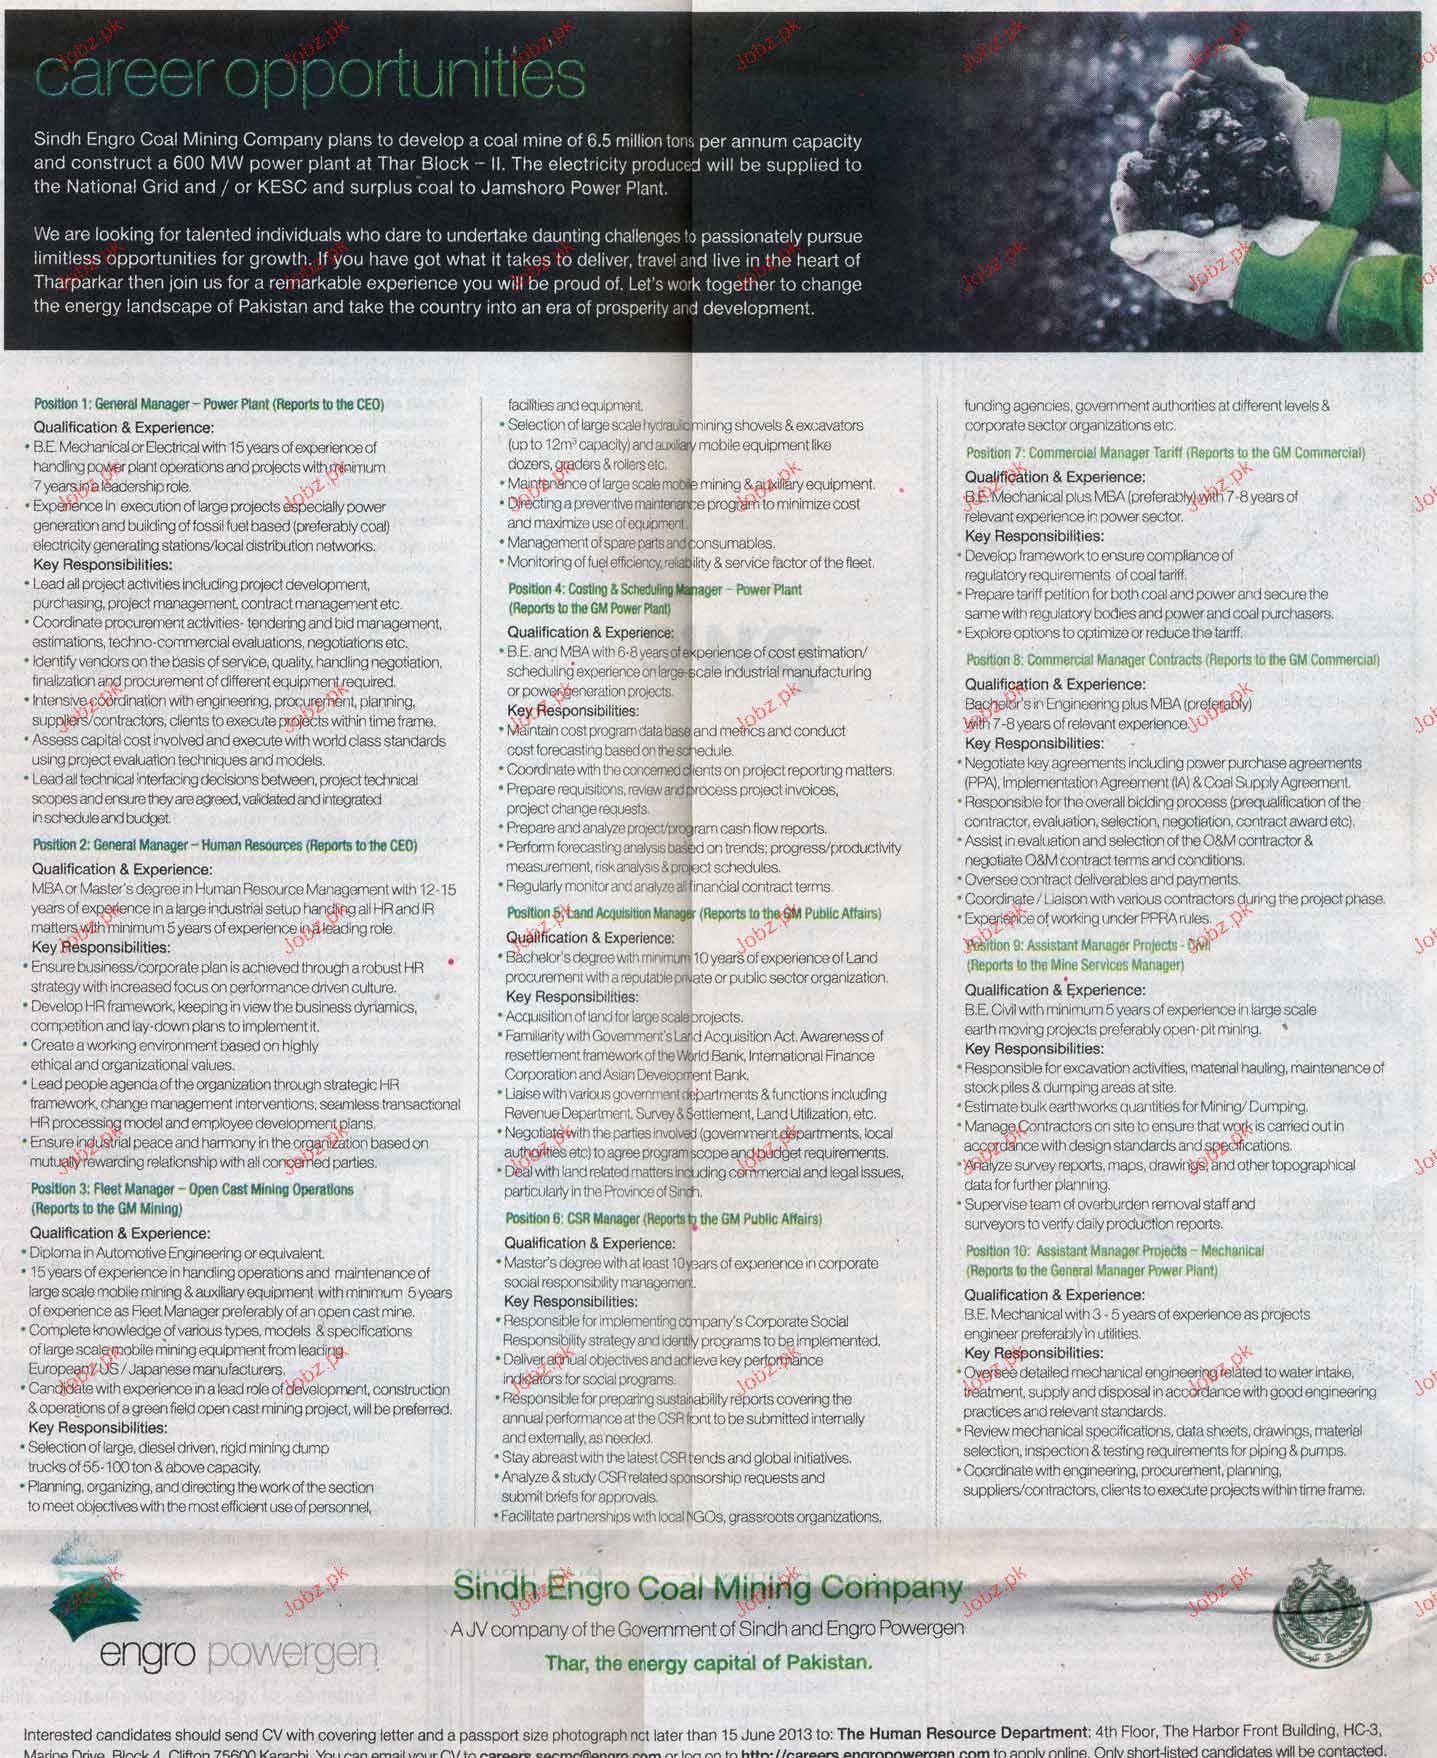 General Manager Power Plant Job Opportunity 2018 Jobs Pakistan Jobz